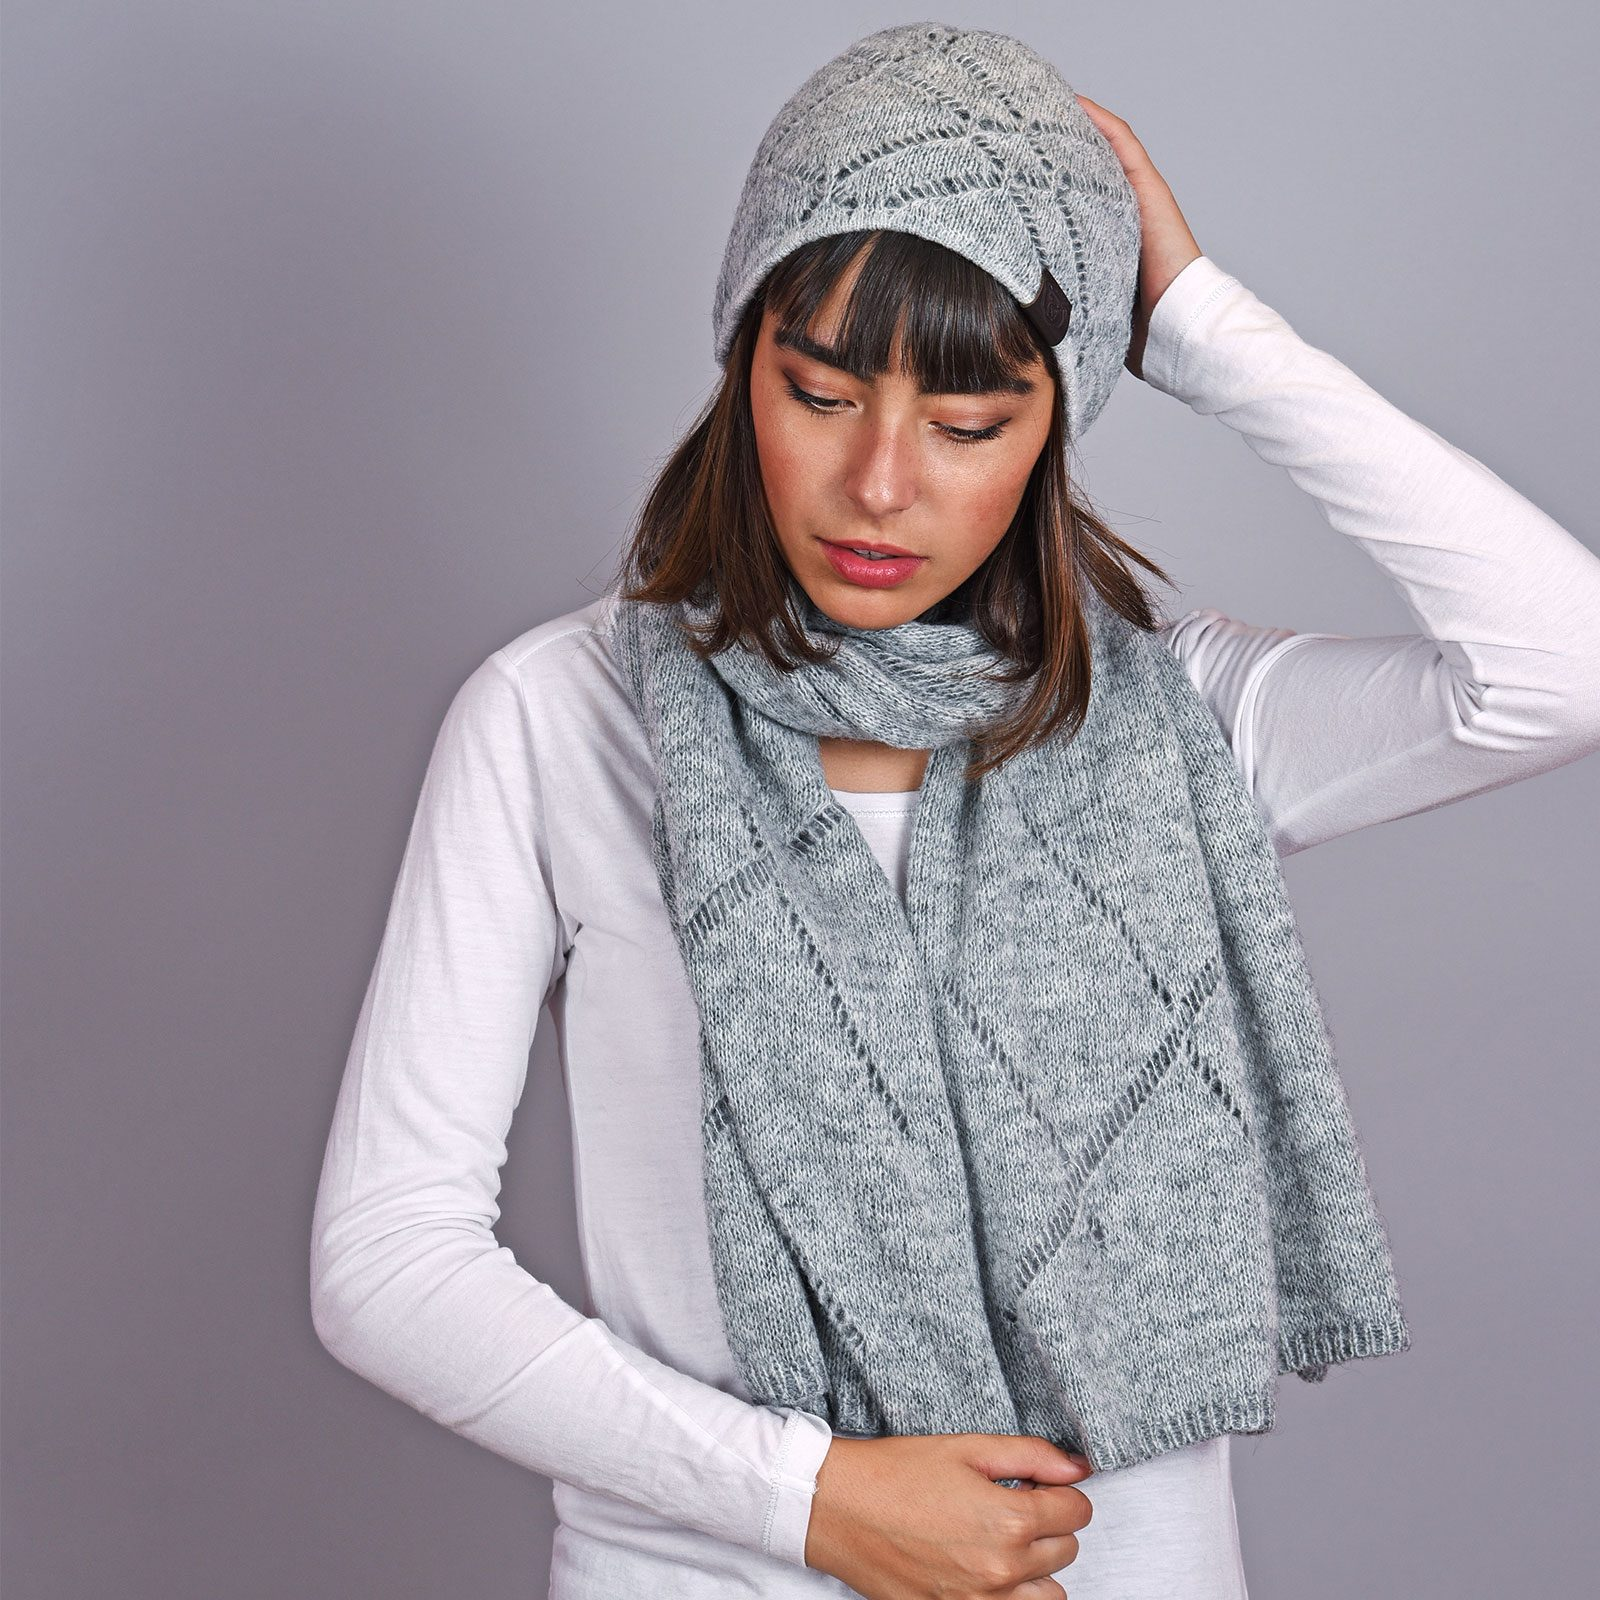 http://lookbook.allee-du-foulard.fr/wp-content/uploads/2018/12/AT-04596-VF16-echarpe-et-bonnet-gris-1600x1600.jpg